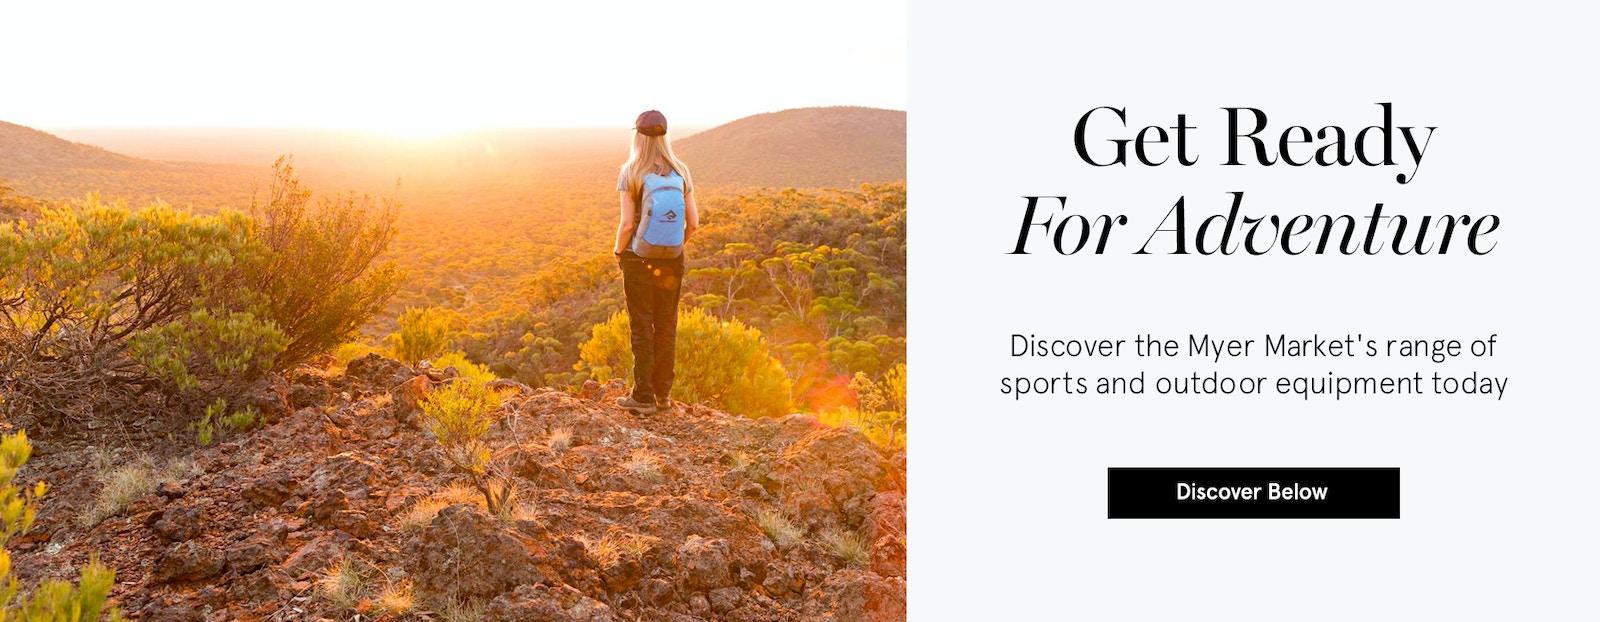 Sports & Outdoors Promo Image